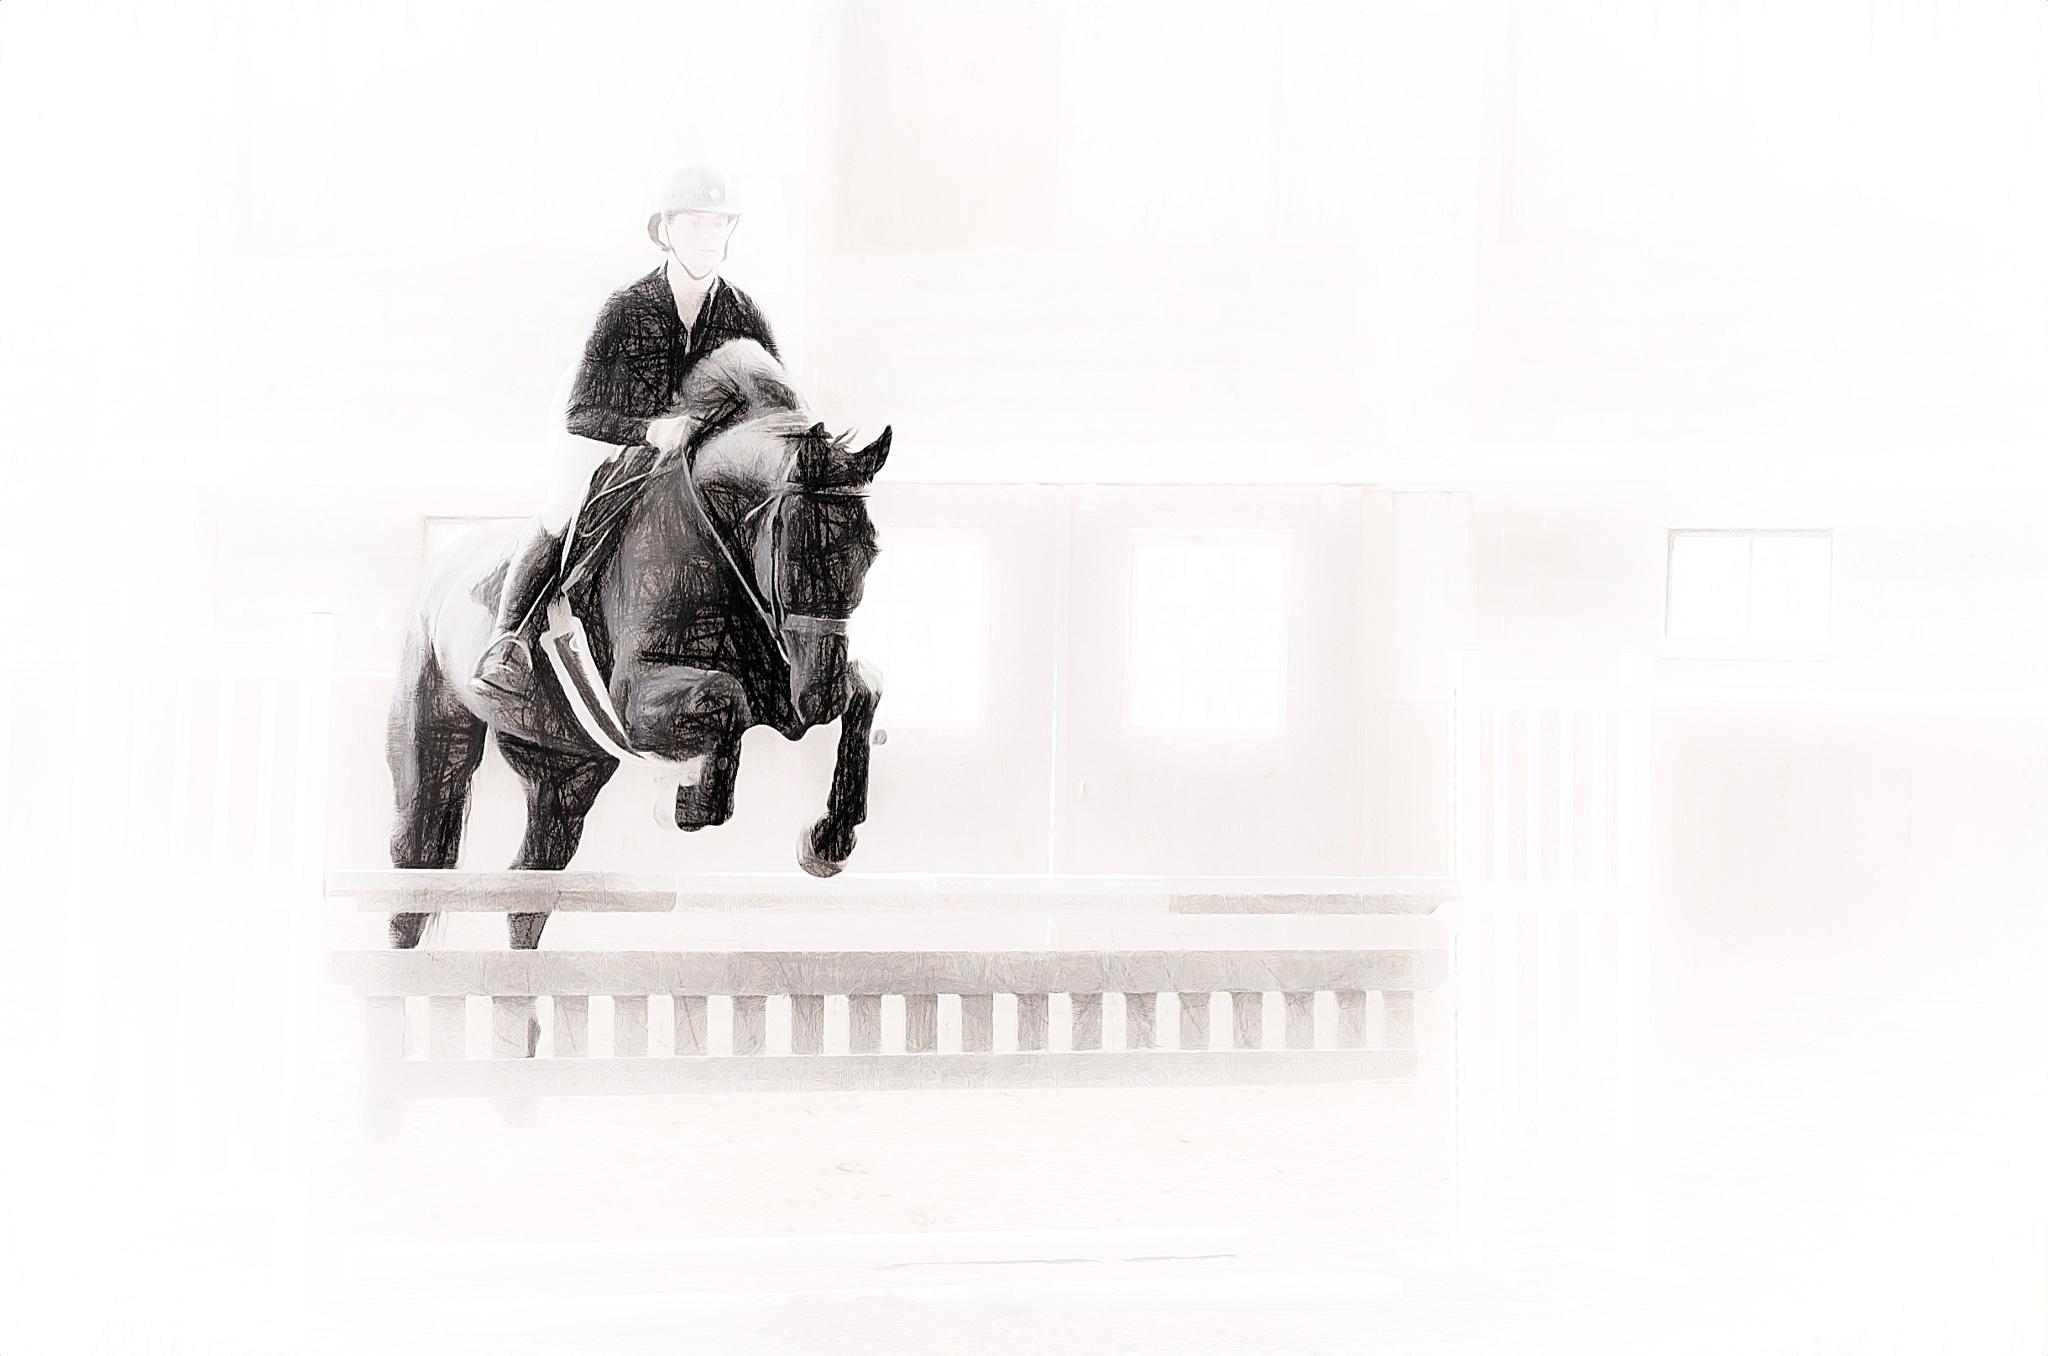 Jumper by JohnEllingson